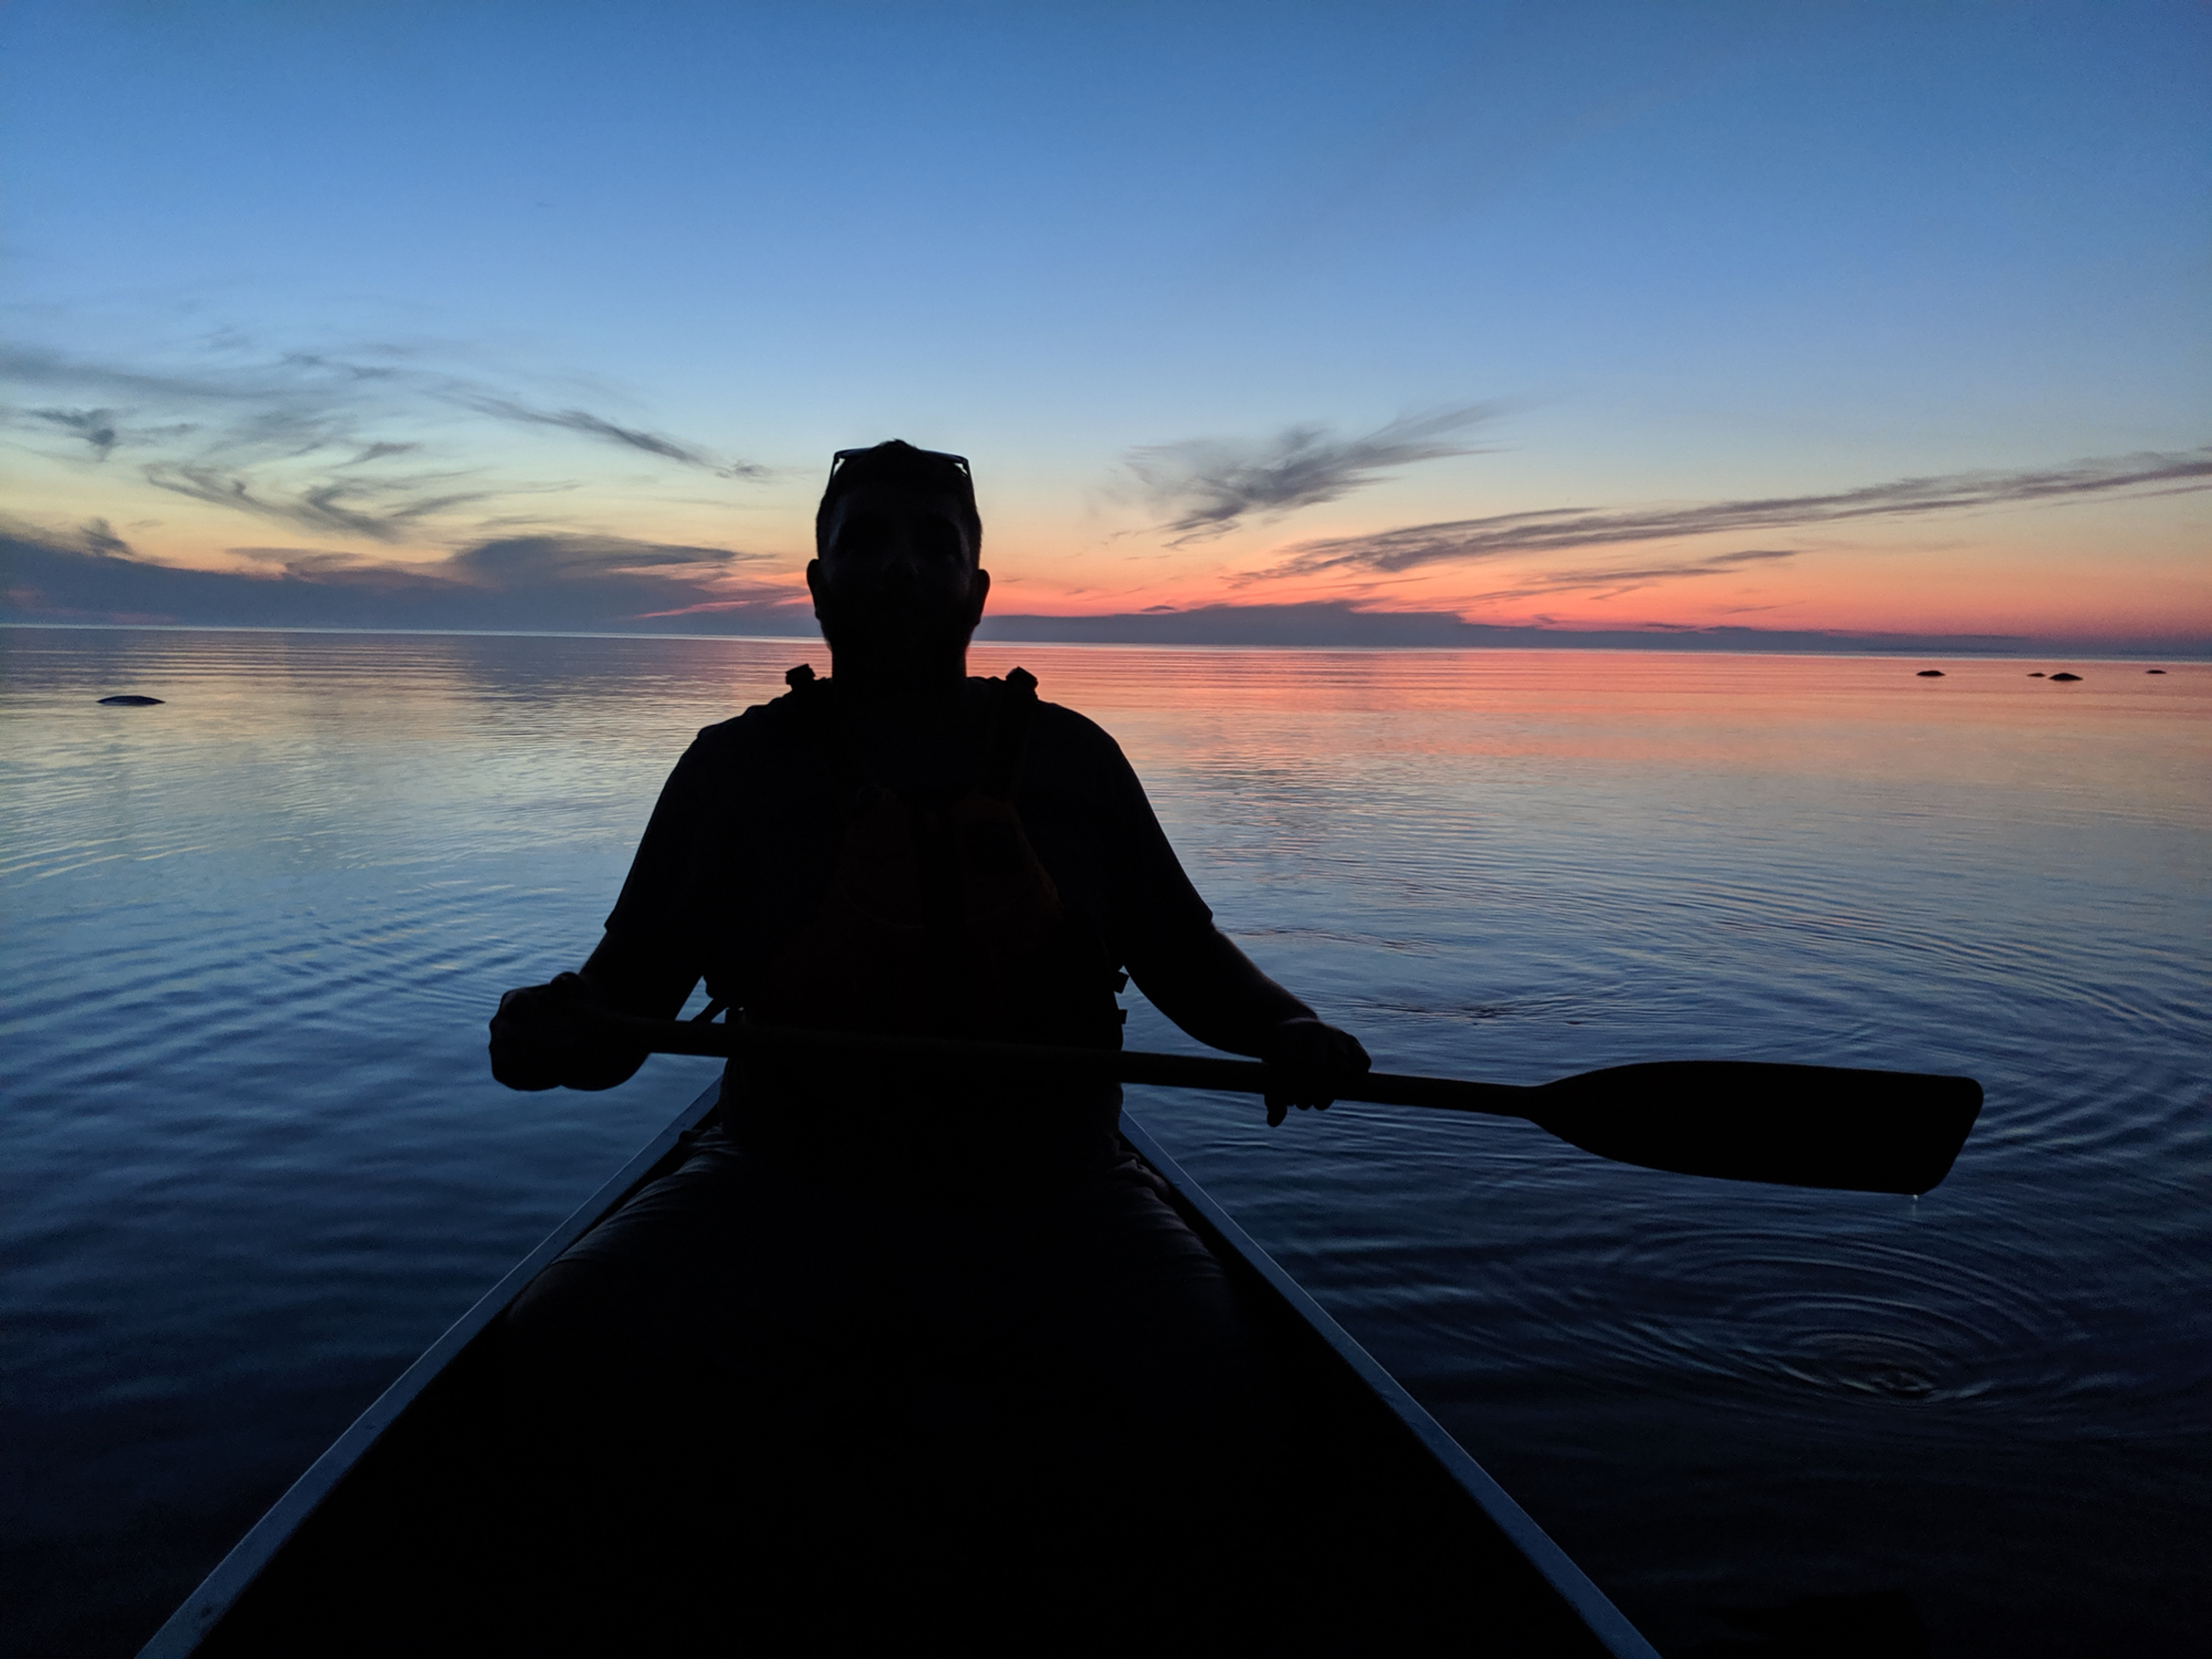 Guided Interpretive Canoe Tour: 2 hours